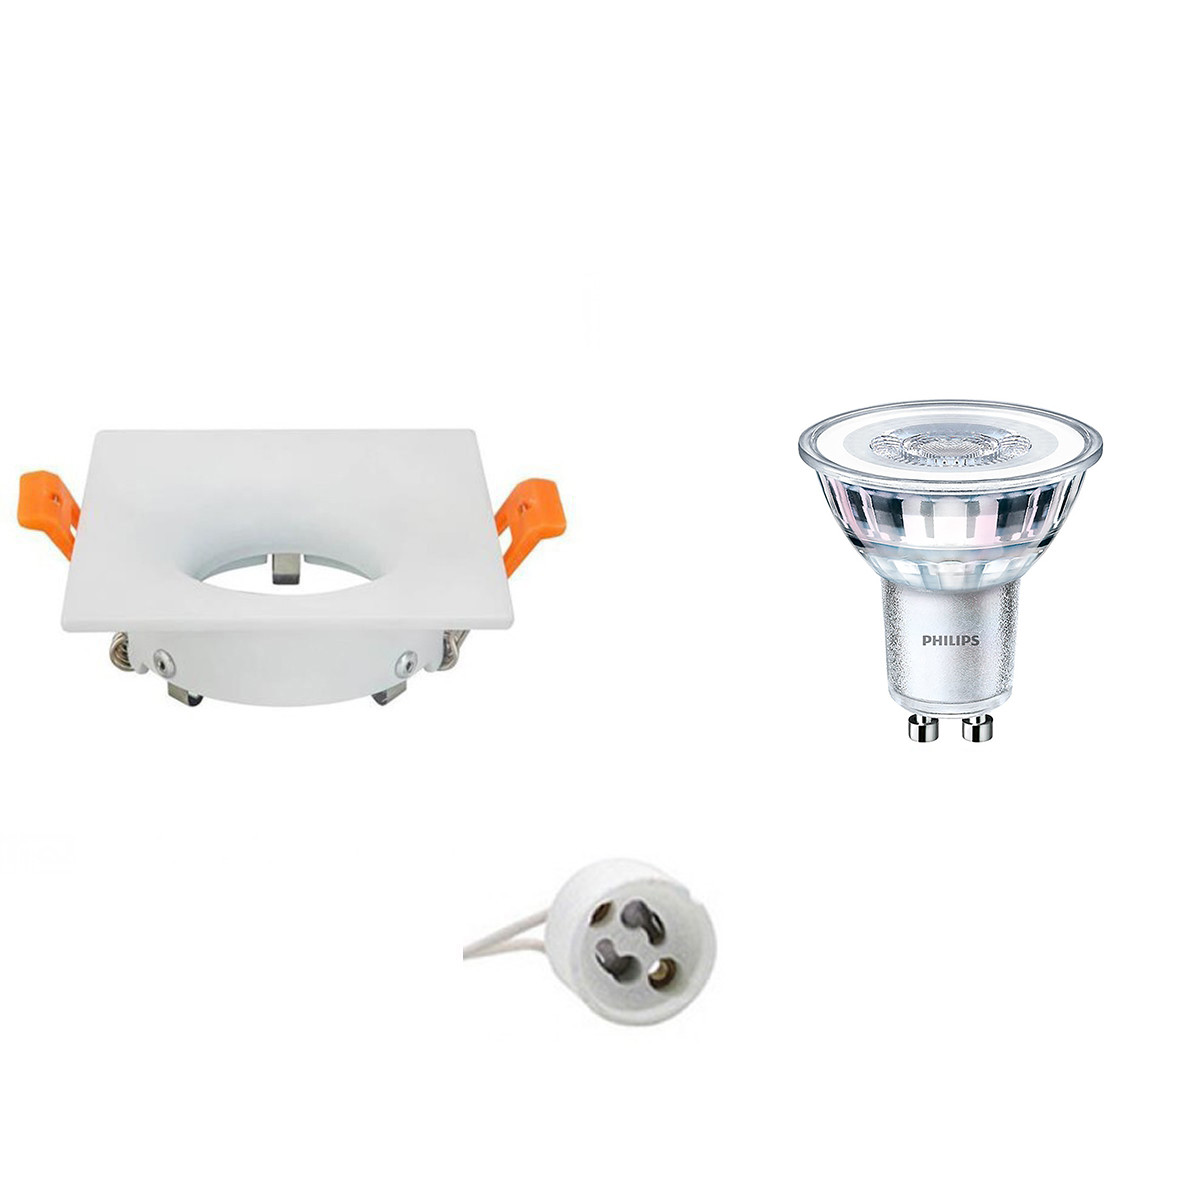 PHILIPS - LED Spot Set - CorePro 830 36D - GU10 Fitting - Dimbaar - Inbouw Vierkant - Mat Wit - 4W -